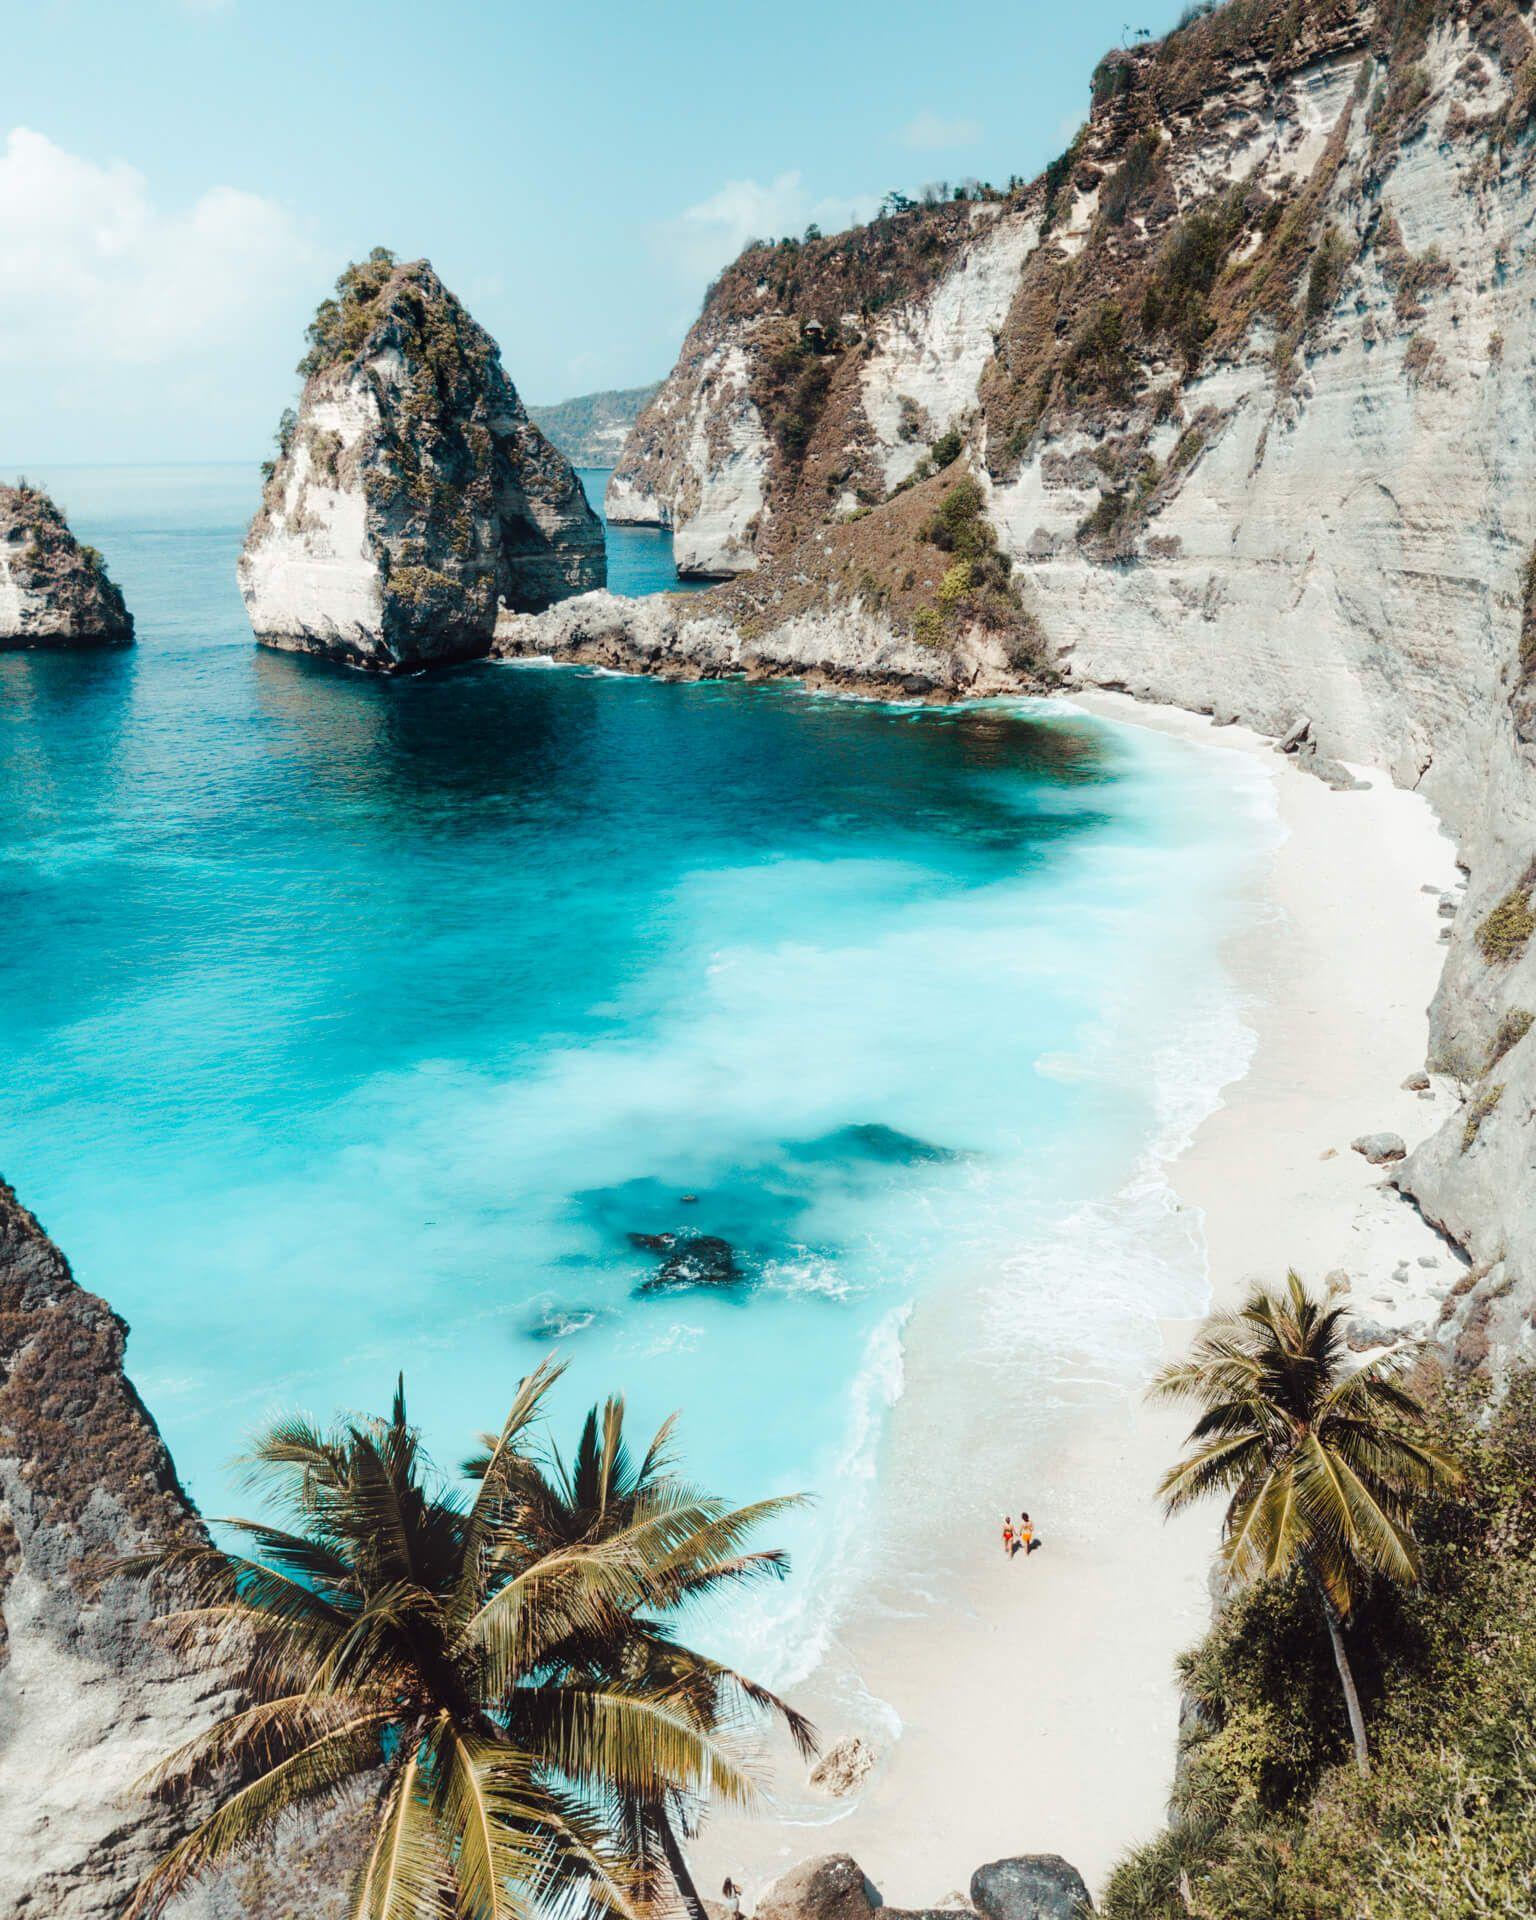 Diamond Beach – Most Beautiful Beach on Nusa Penida in Bali On the Bali island, Nusa Penida is one of the most beautiful beaches y